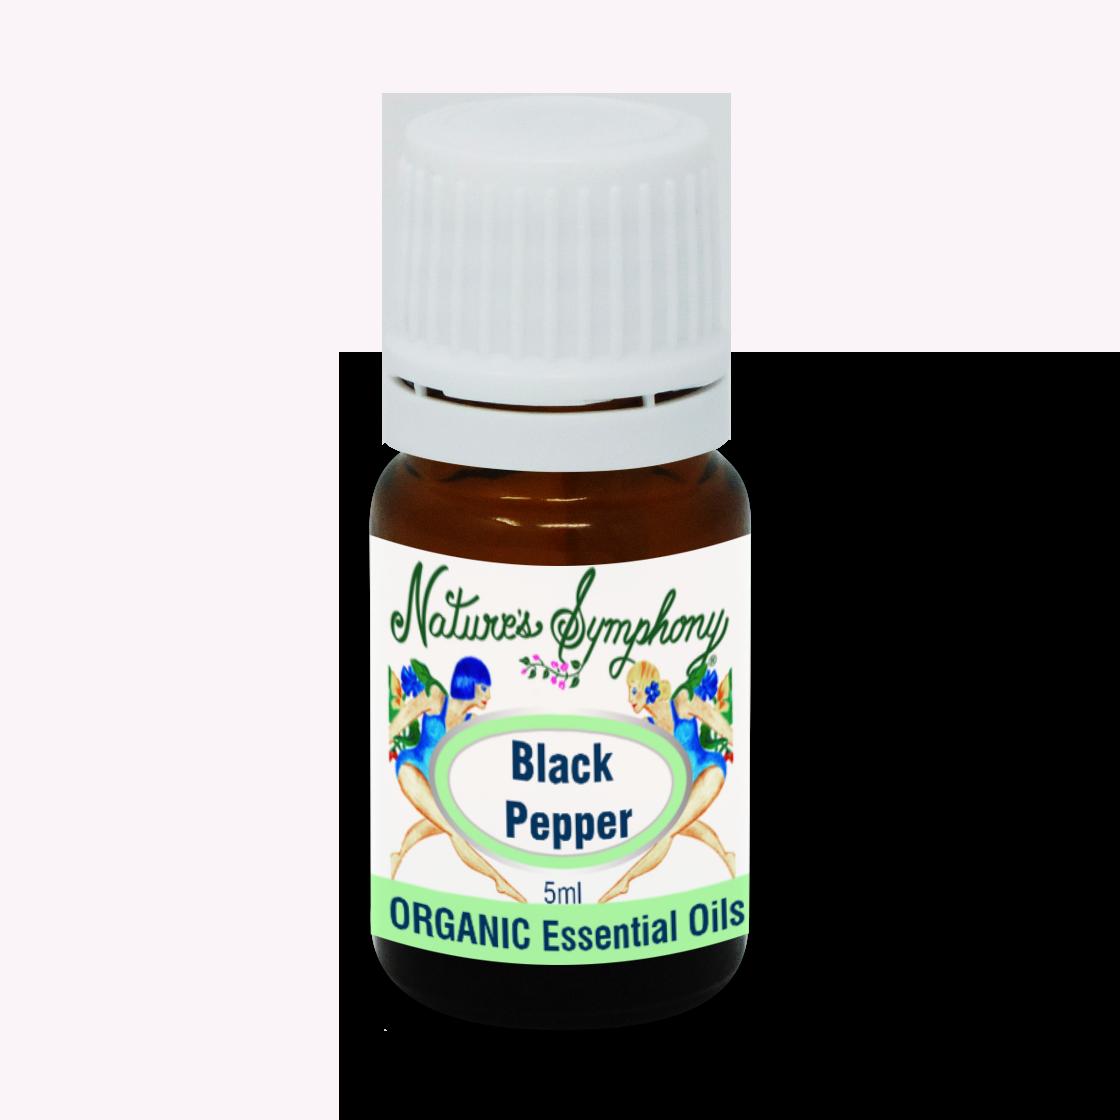 Black Pepper, Organic/Wildcrafted oil - 5ml